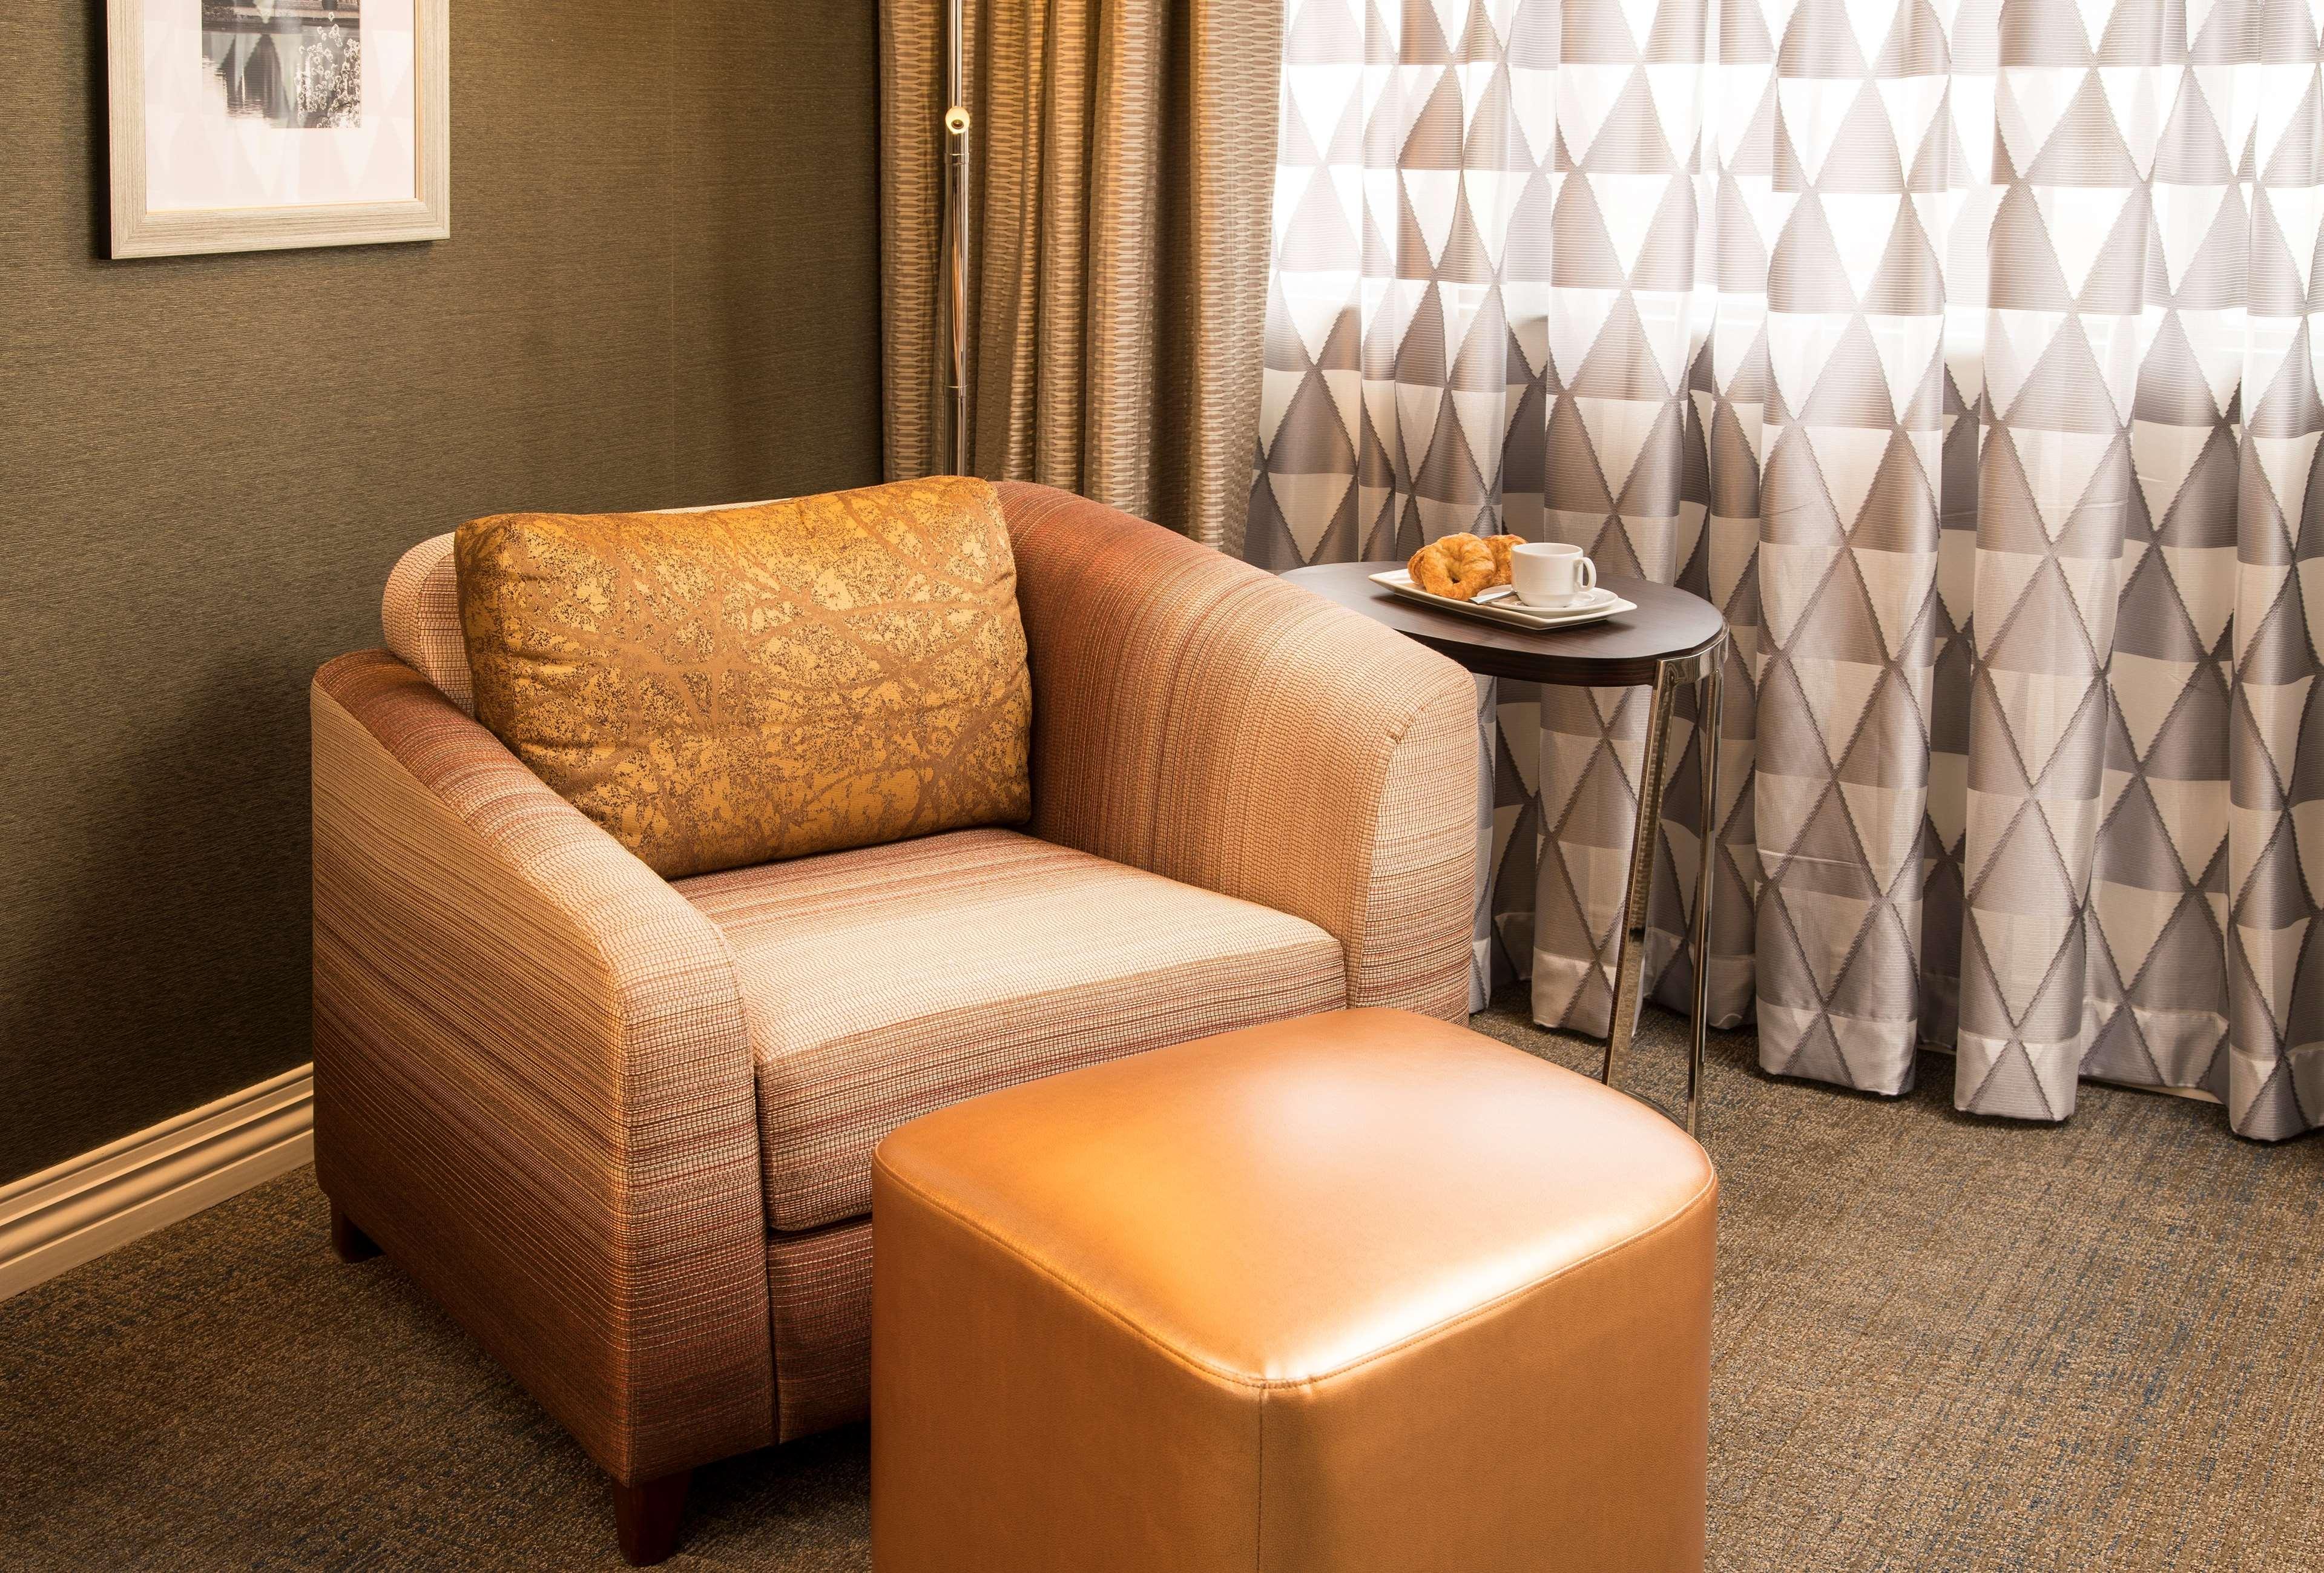 Hilton Washington DC/Rockville Hotel & Executive Meeting Ctr image 30